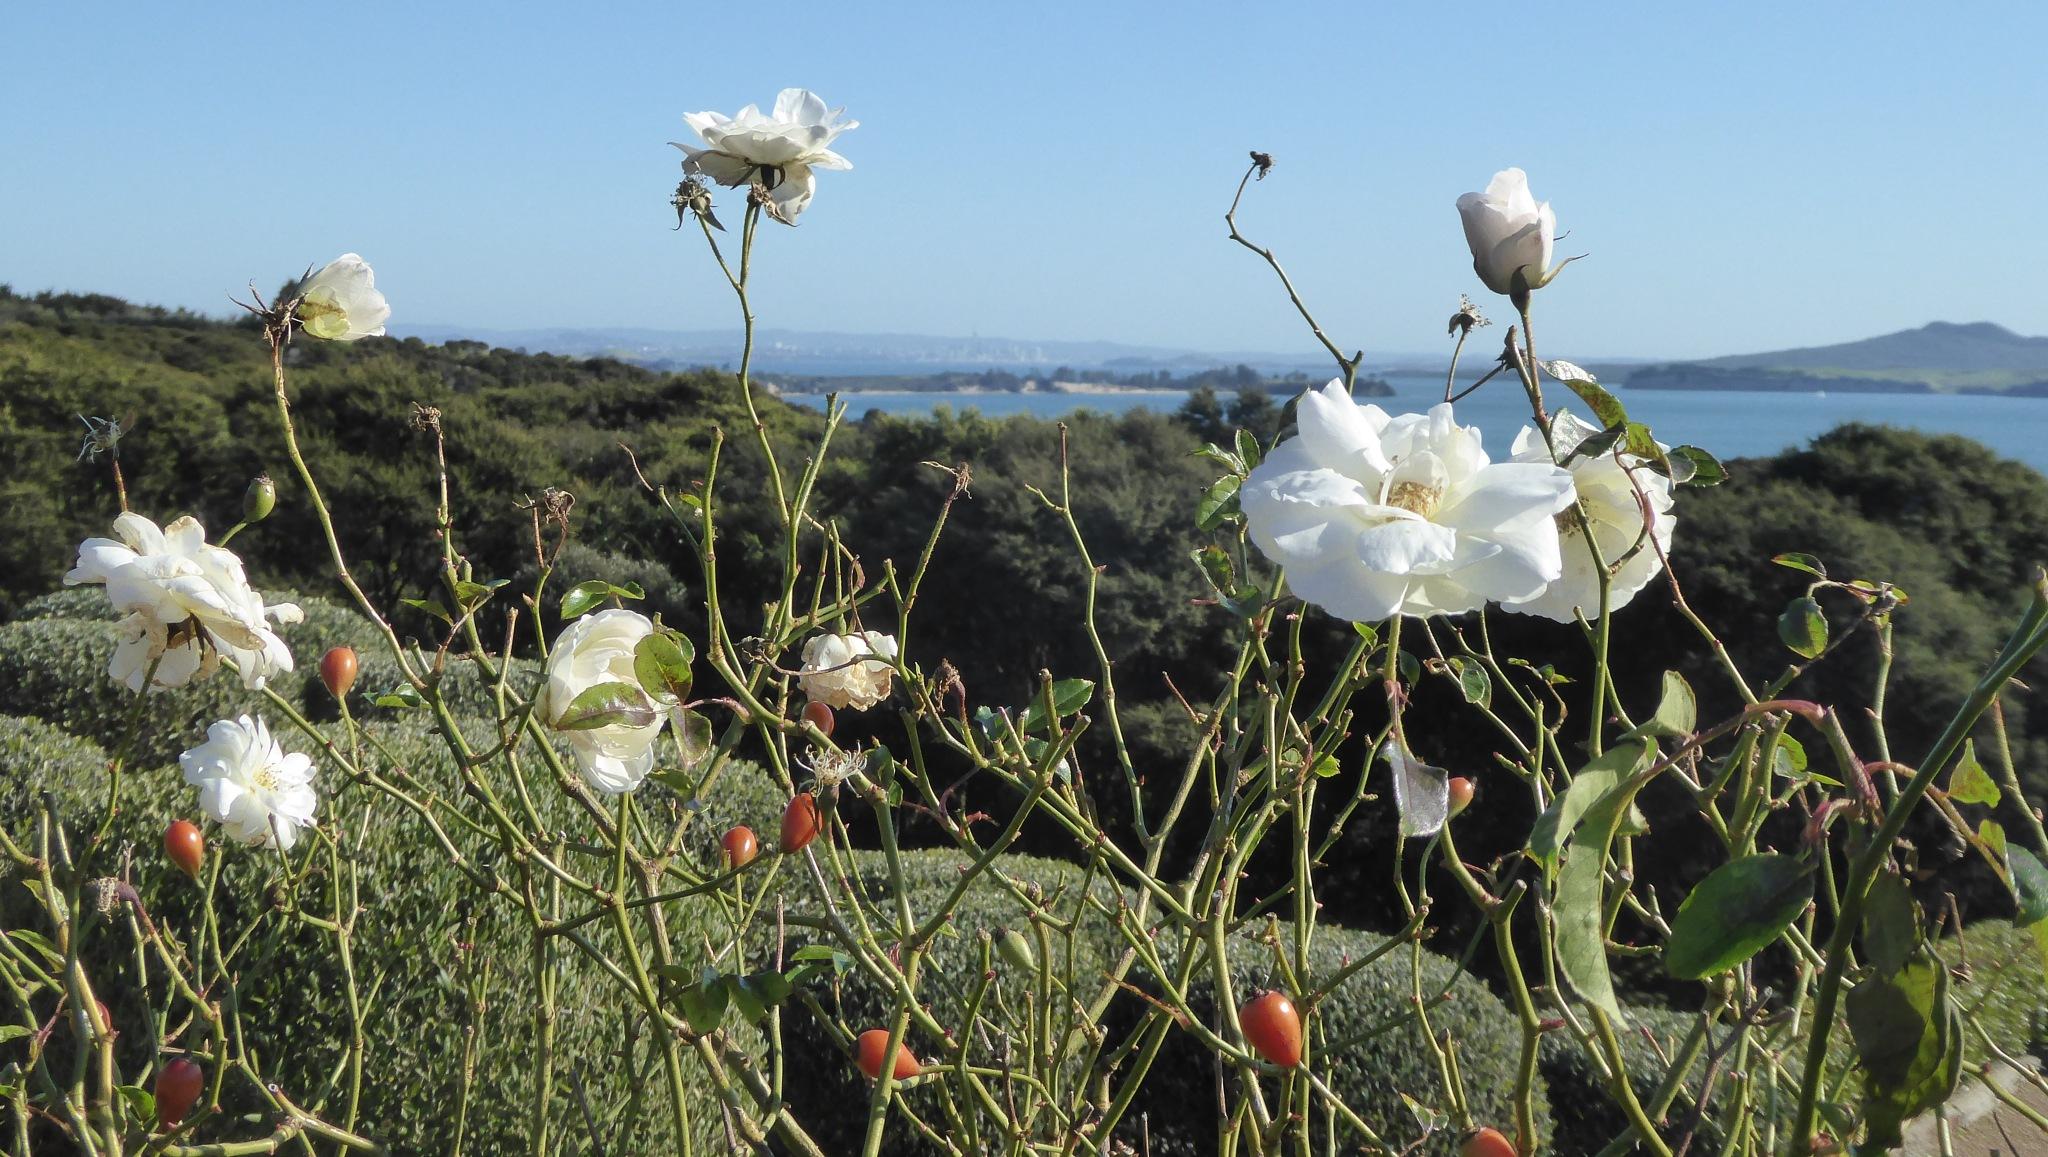 Summer roses by Aroundtheworldin8000days